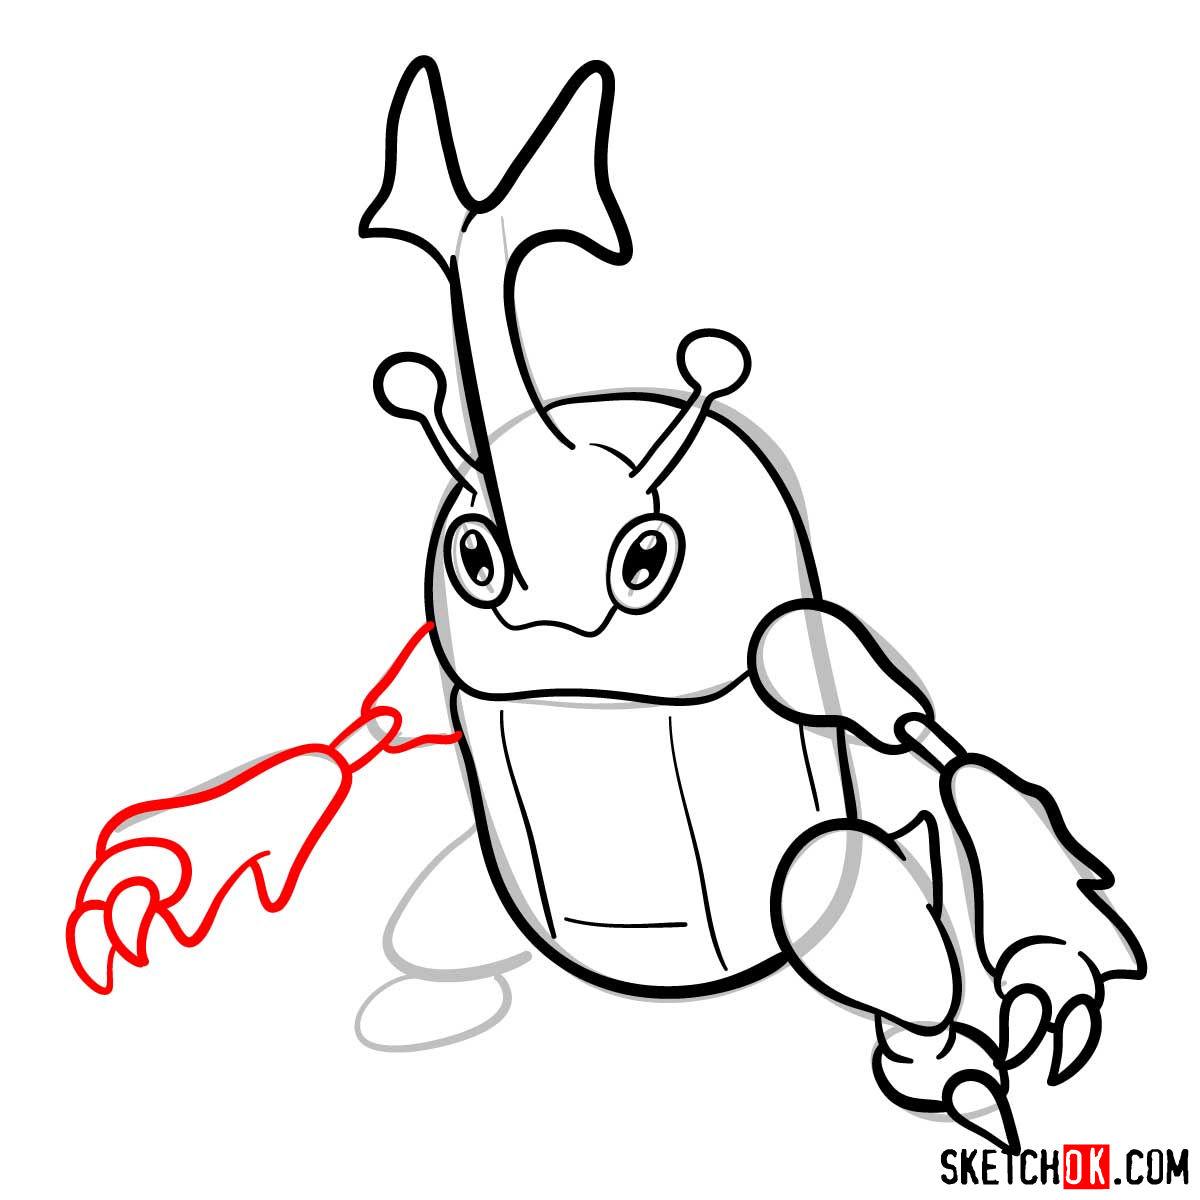 How to draw Heracross Pokemon - step 09